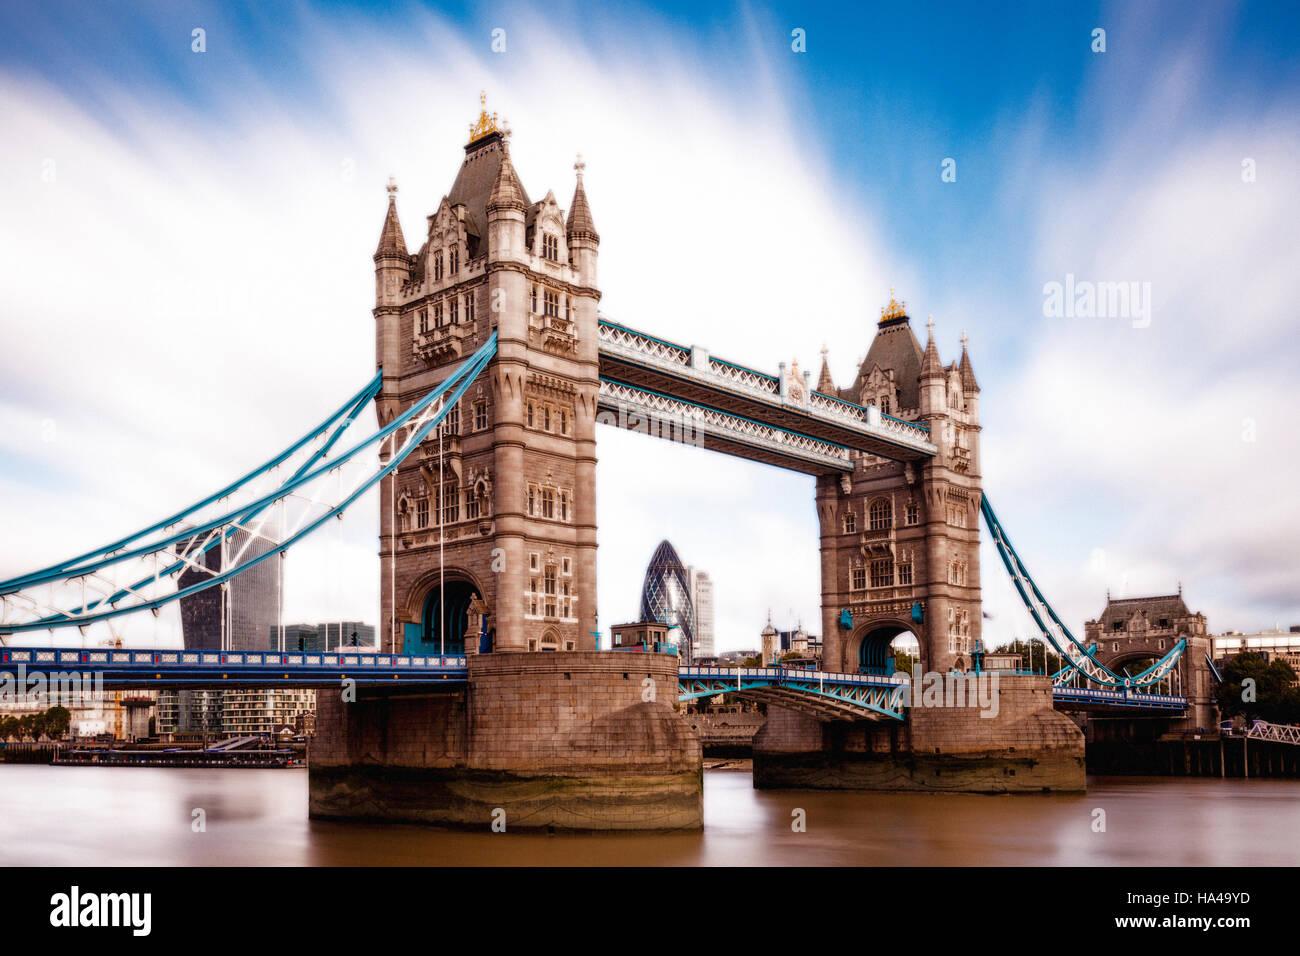 Le Tower Bridge et la Tamise, Londres, Angleterre Photo Stock